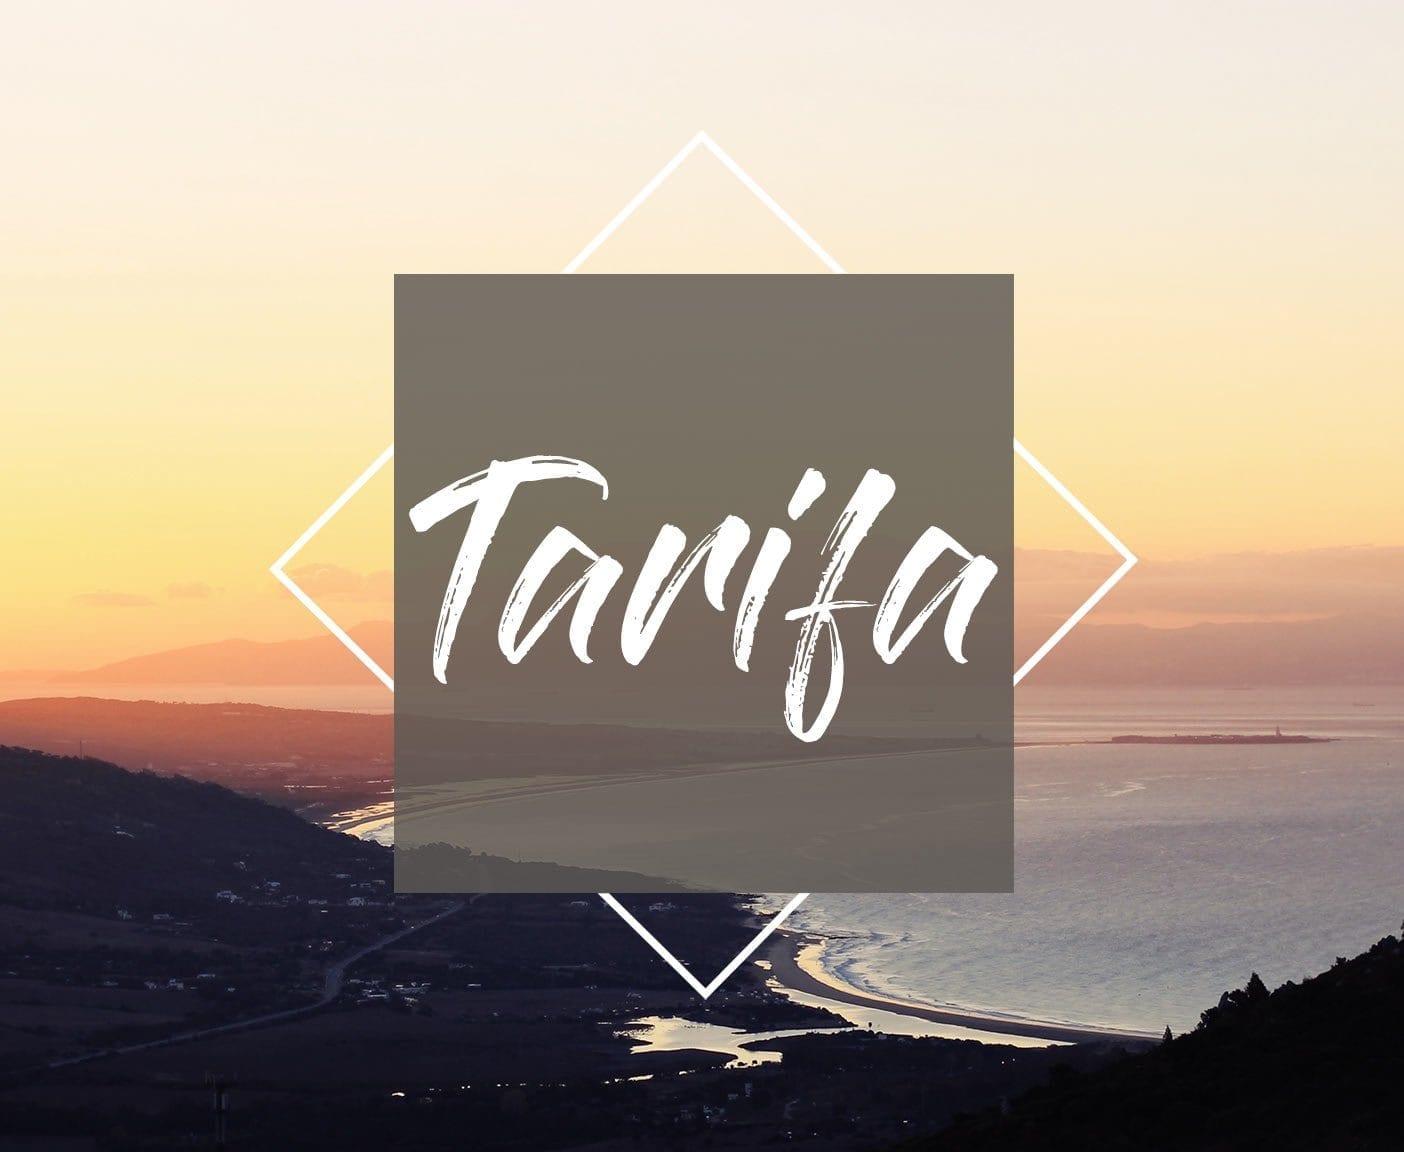 tarifa-wohnmobil-reise-spanien